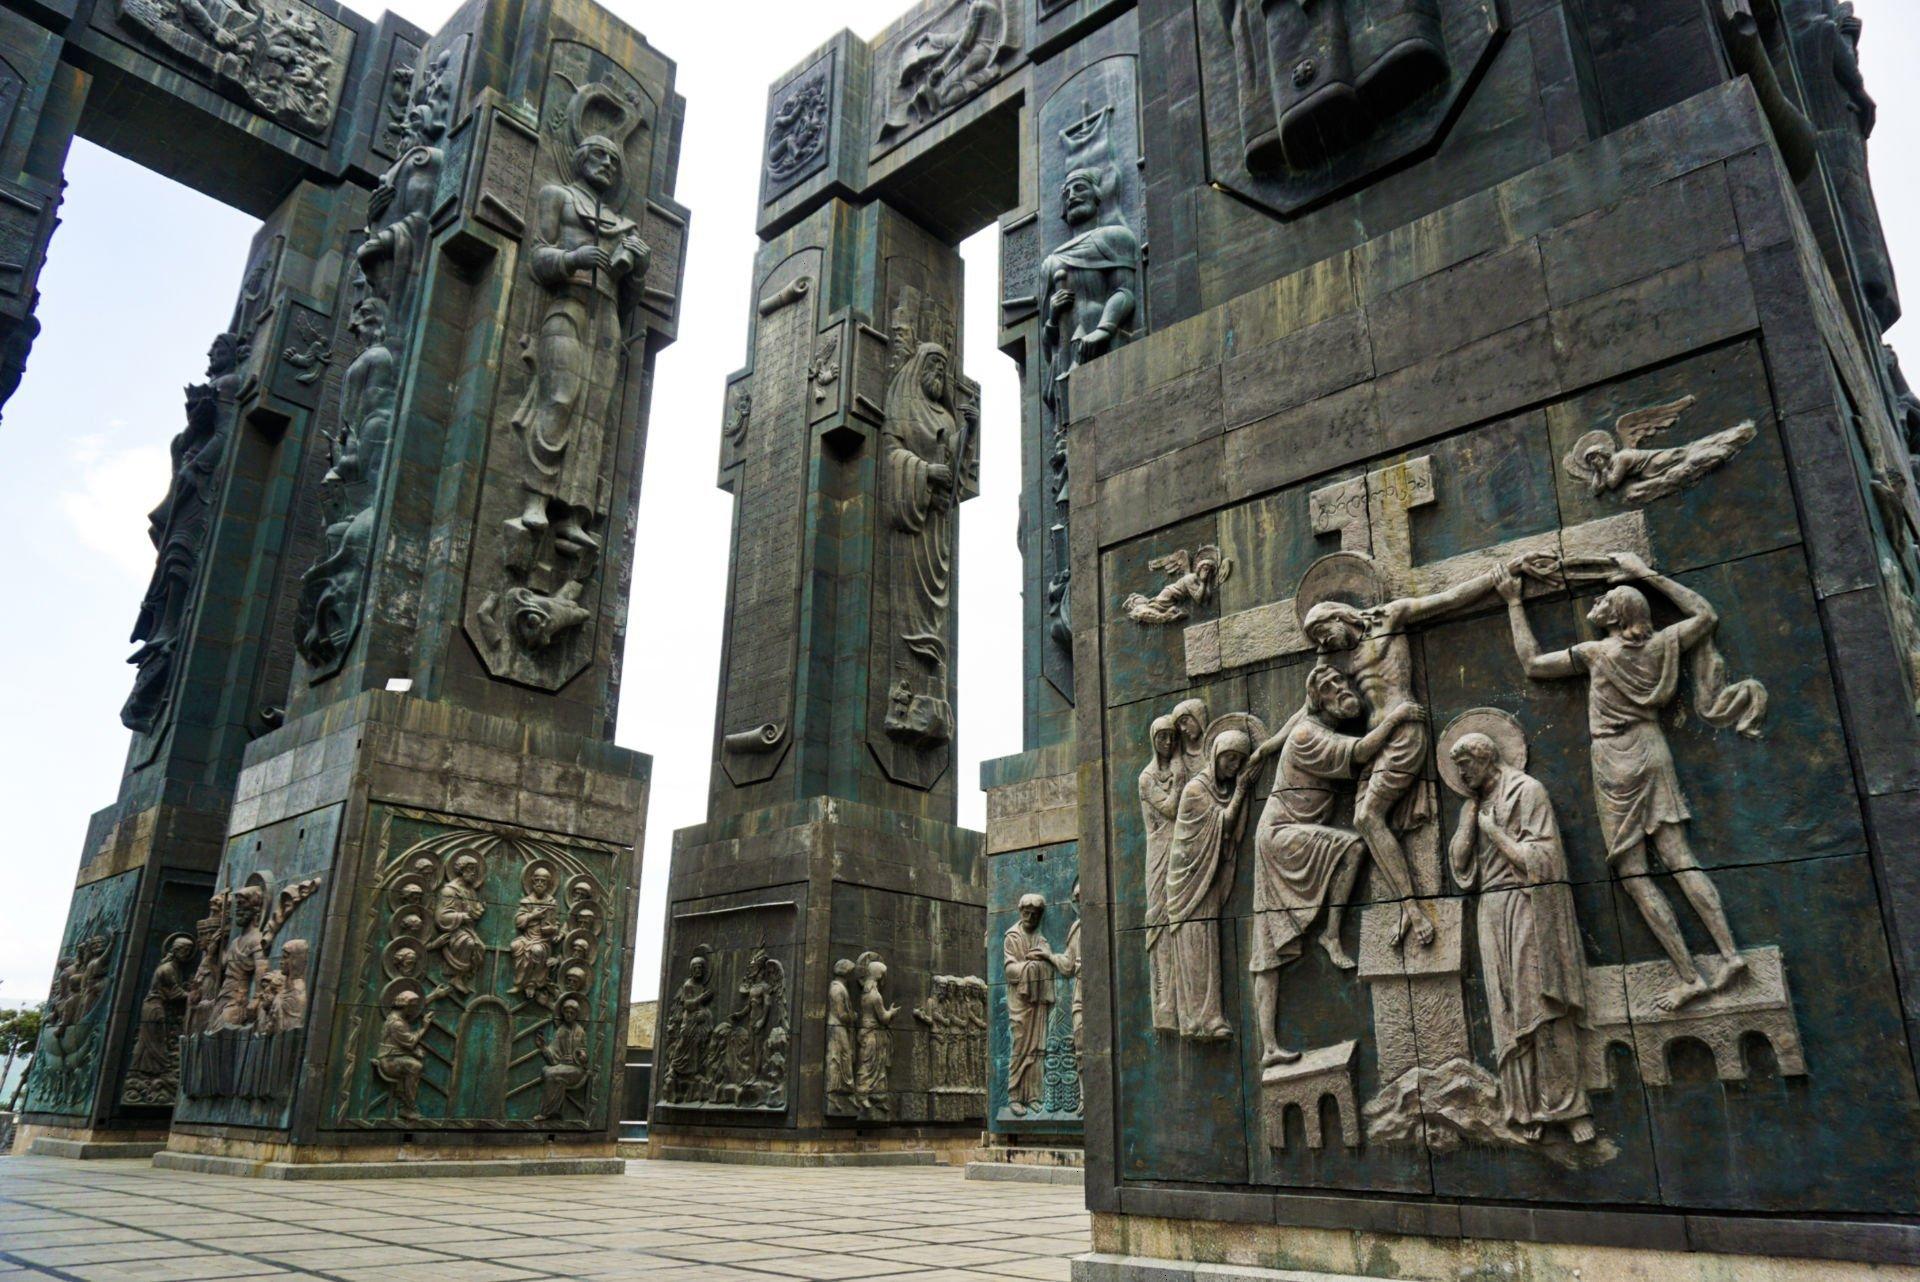 Chronicles of Georgia, Tbilisi, Georgia - Experiencing the Globe